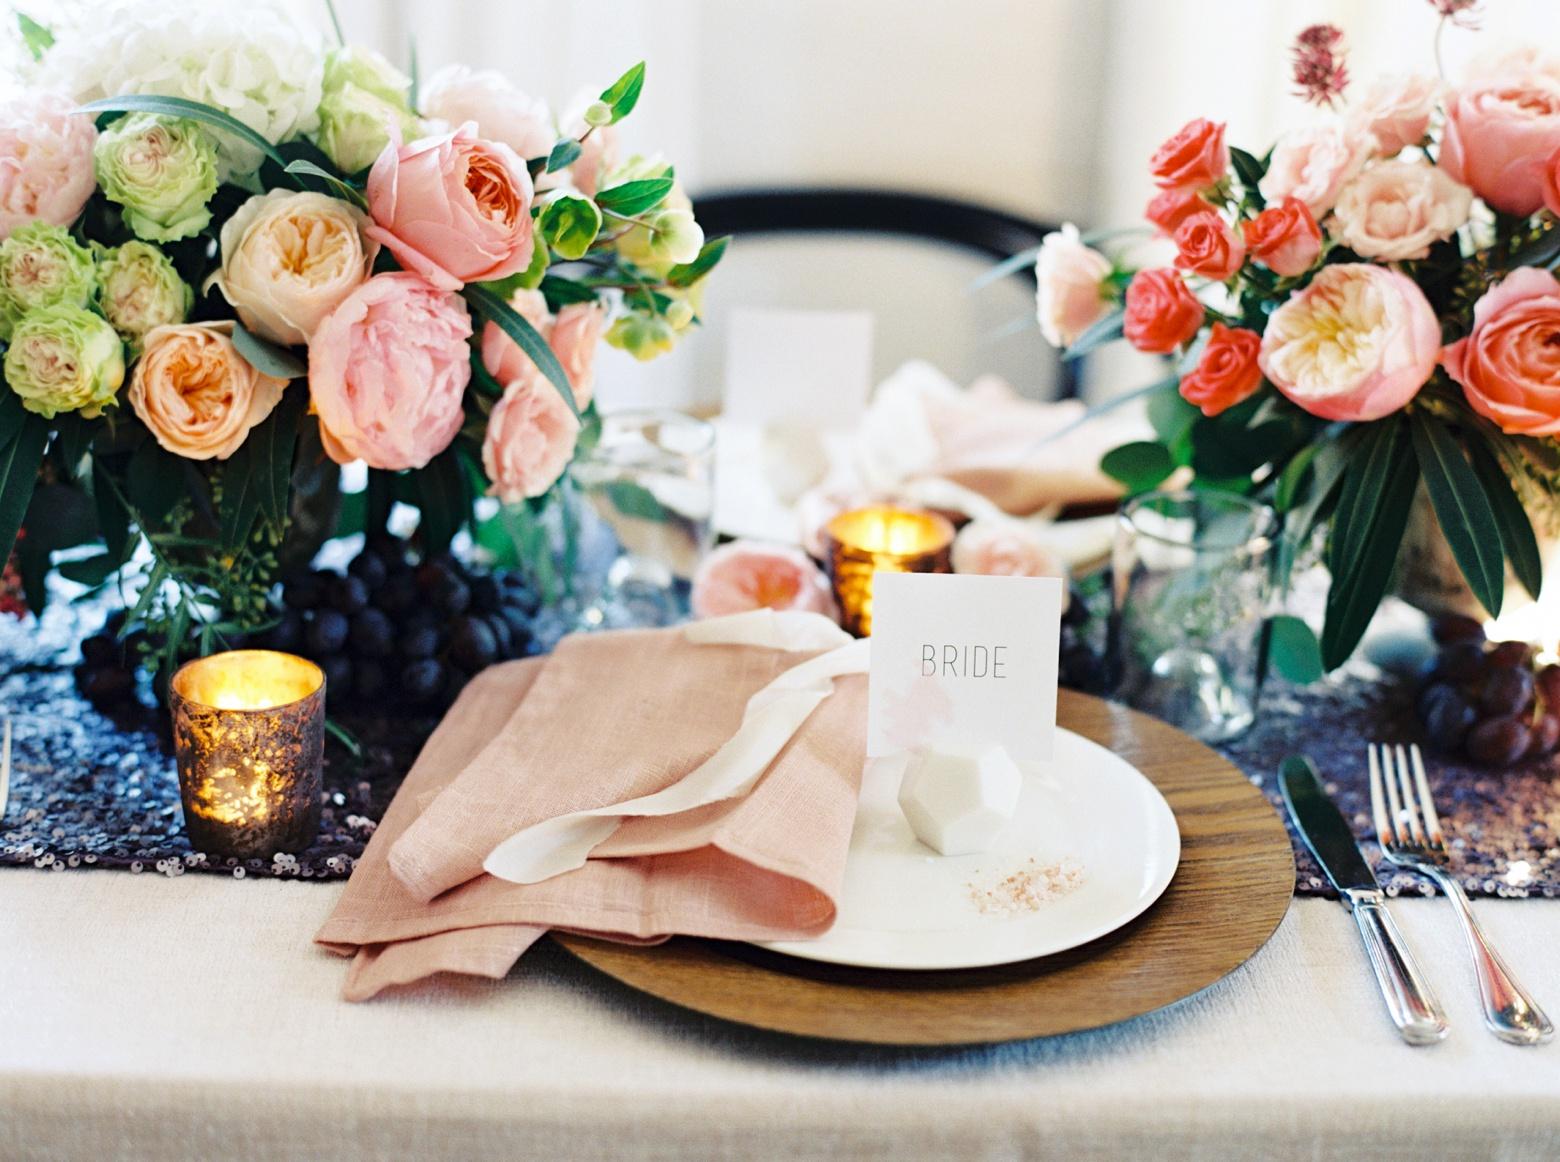 Blush and Grey Wedding by The Happy Bloom_0008.jpg